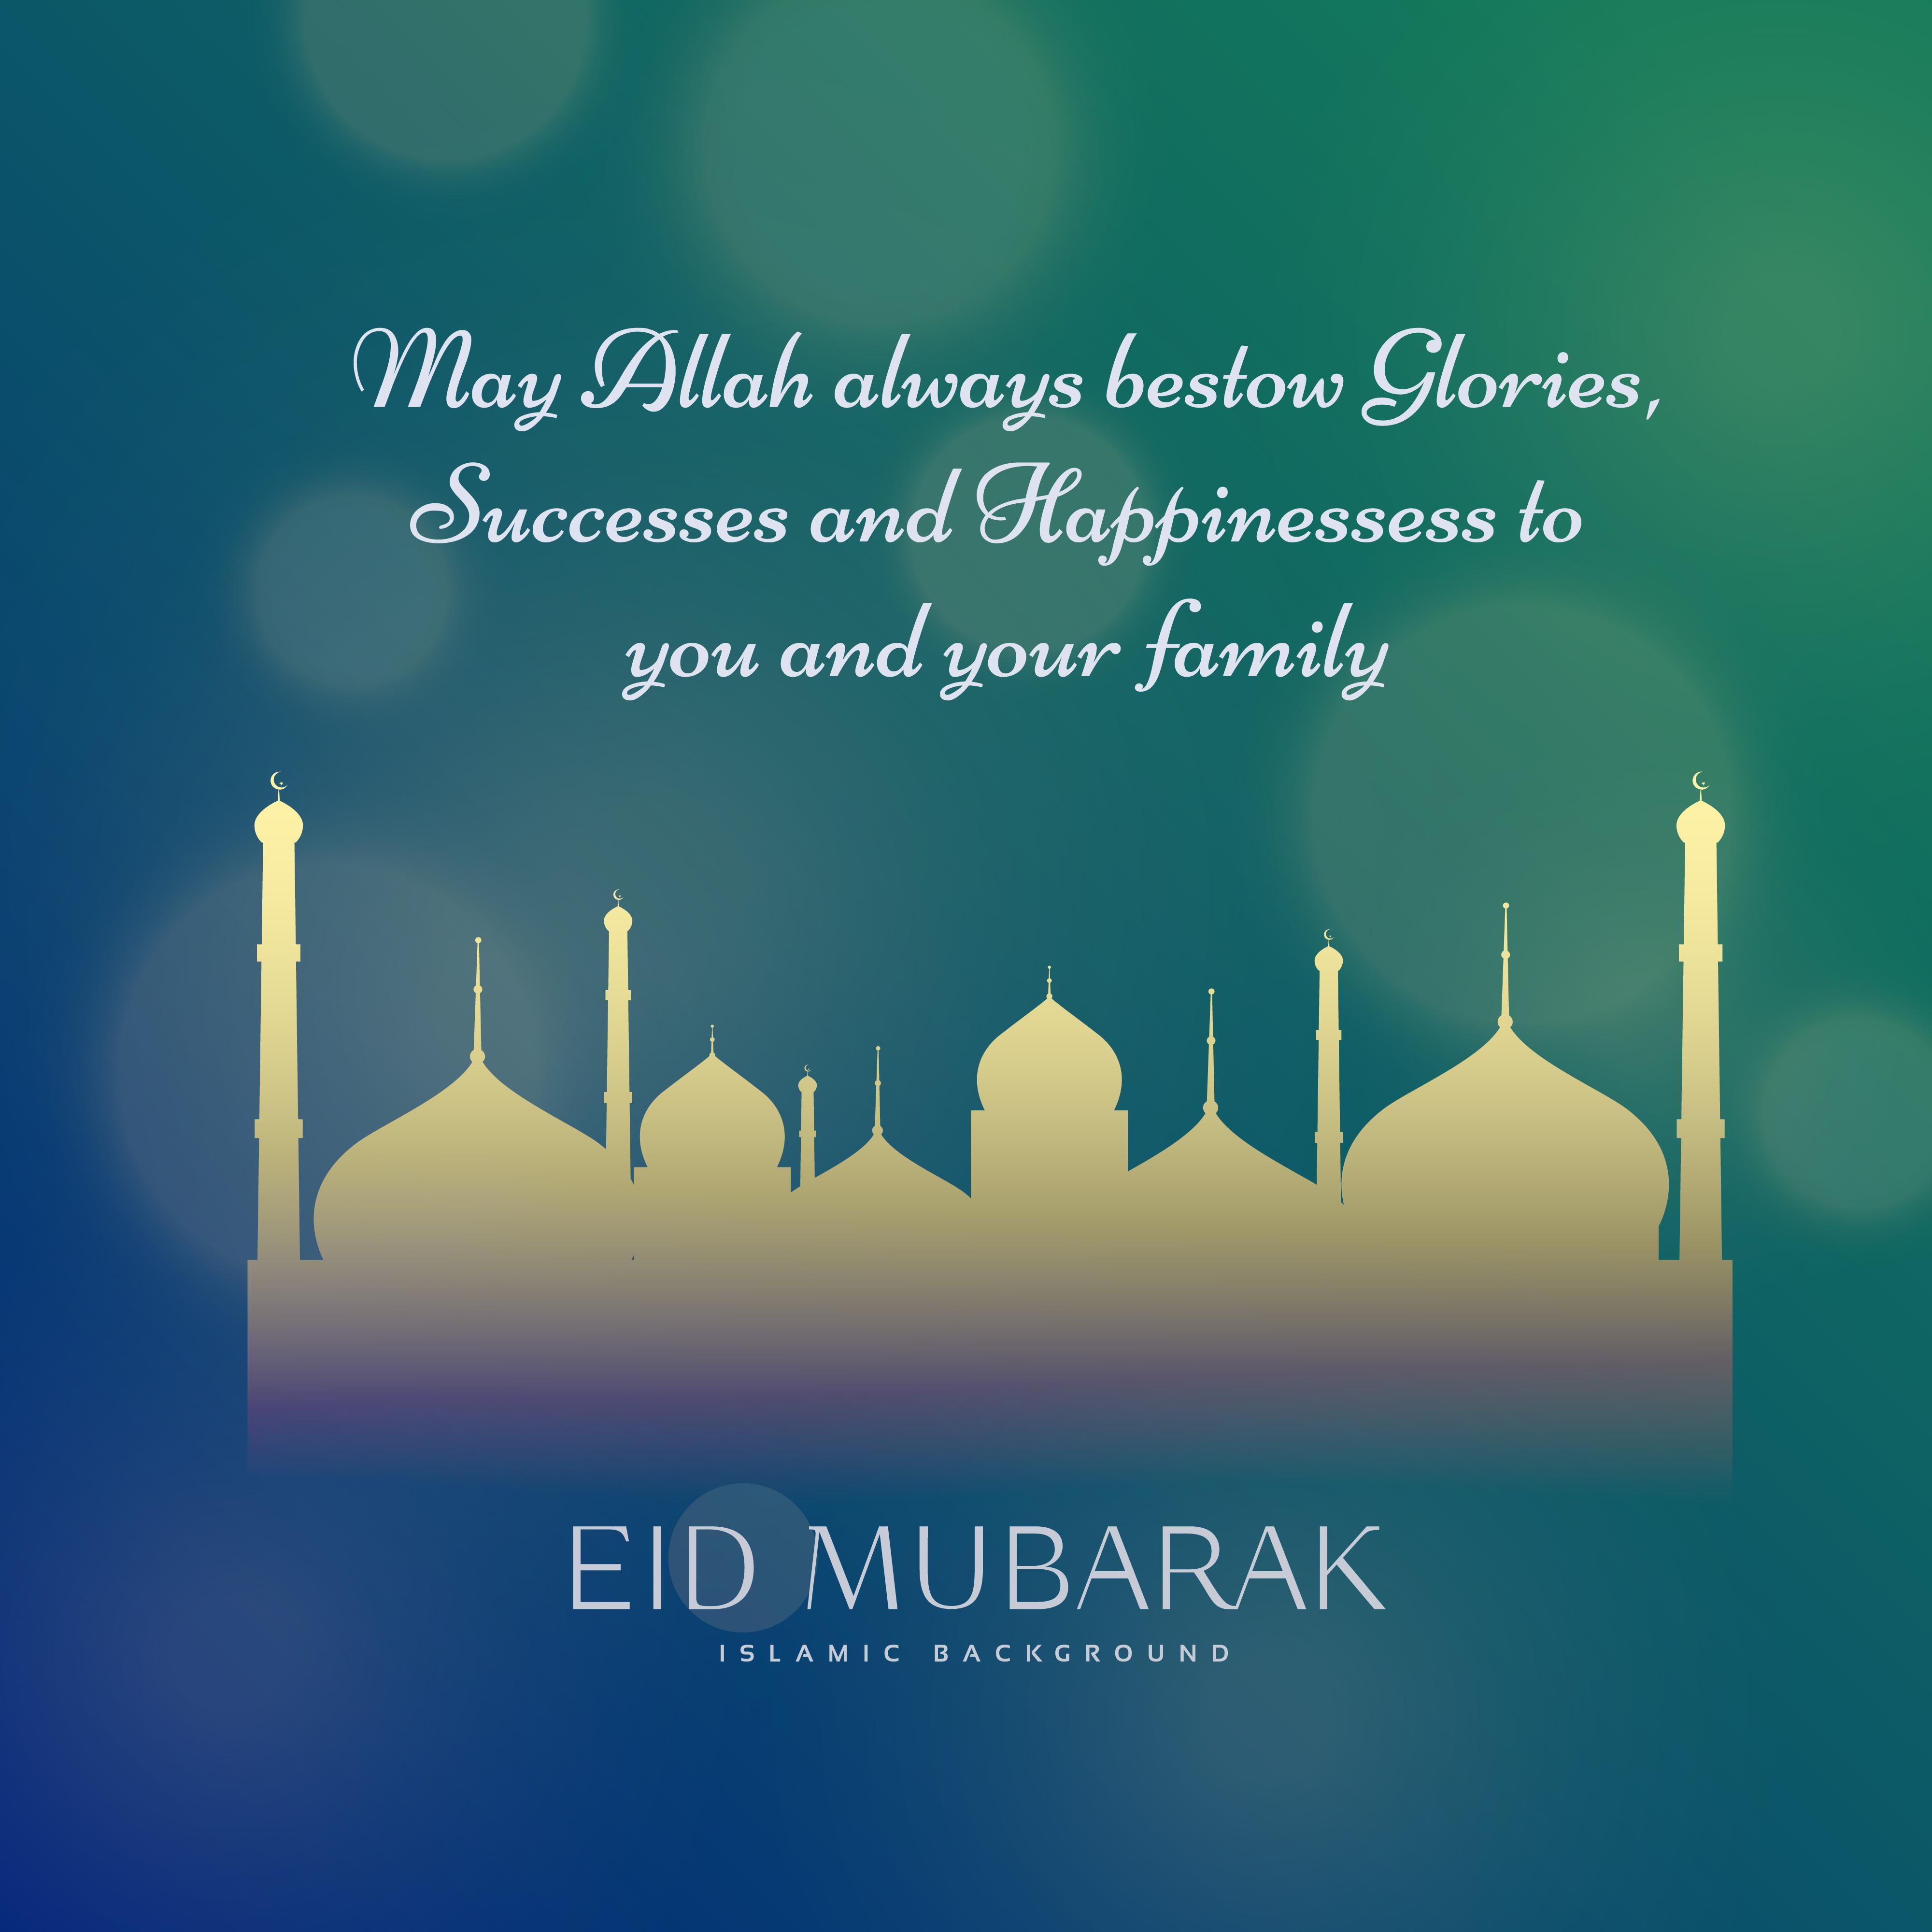 Muslim Eid Festival Wishes Greeting Card Design Download Free